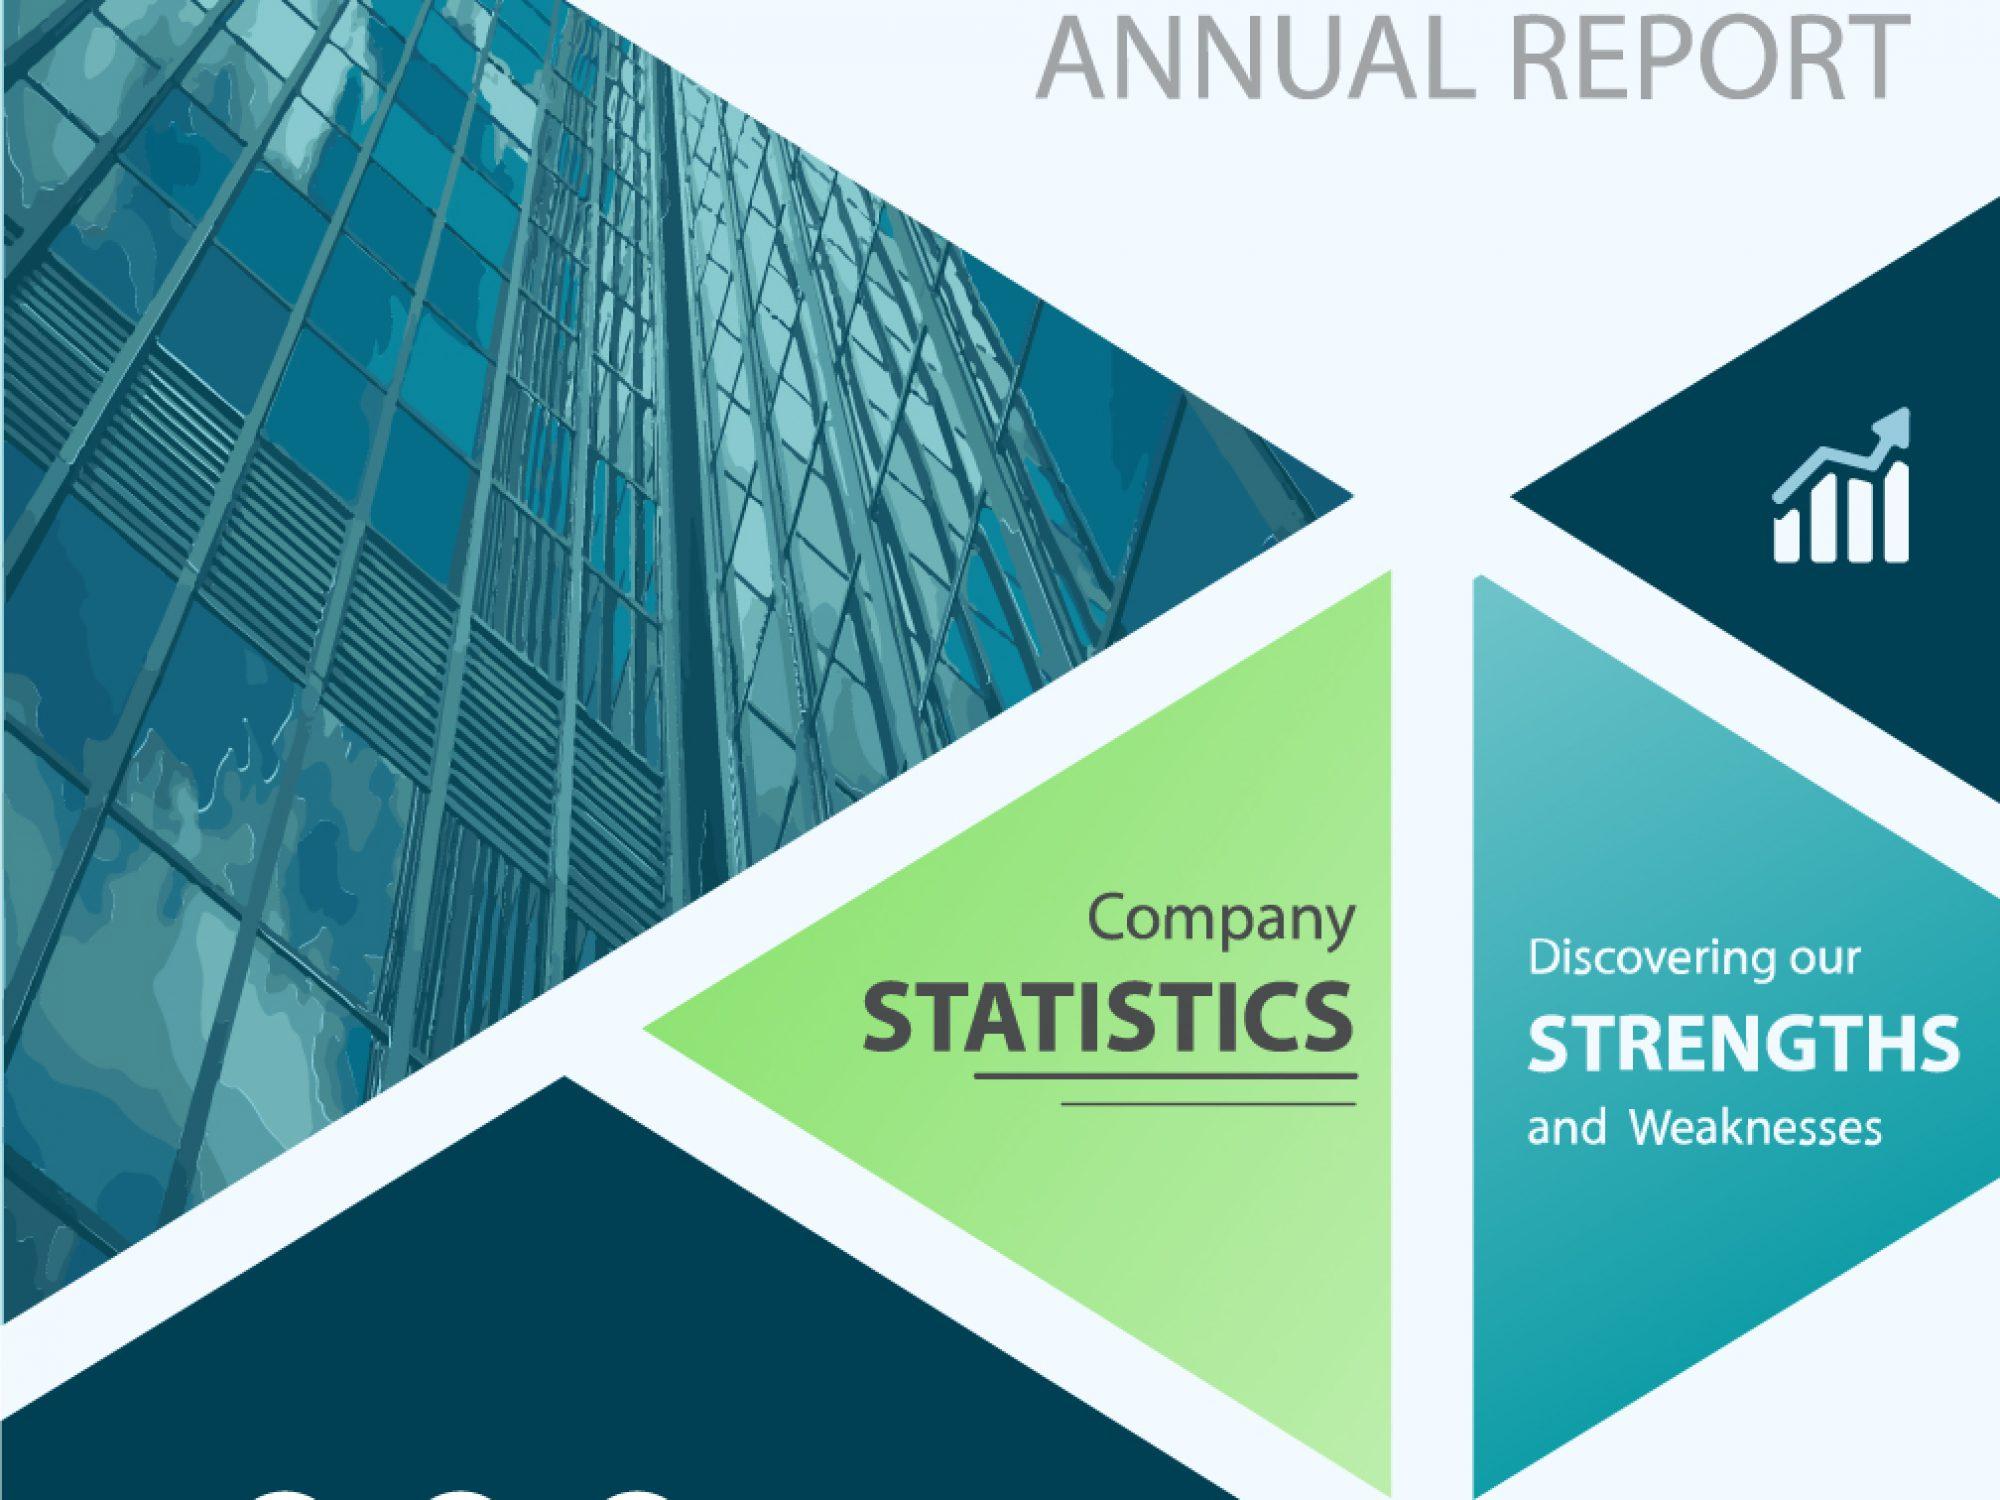 ImVida Annual Report Cover